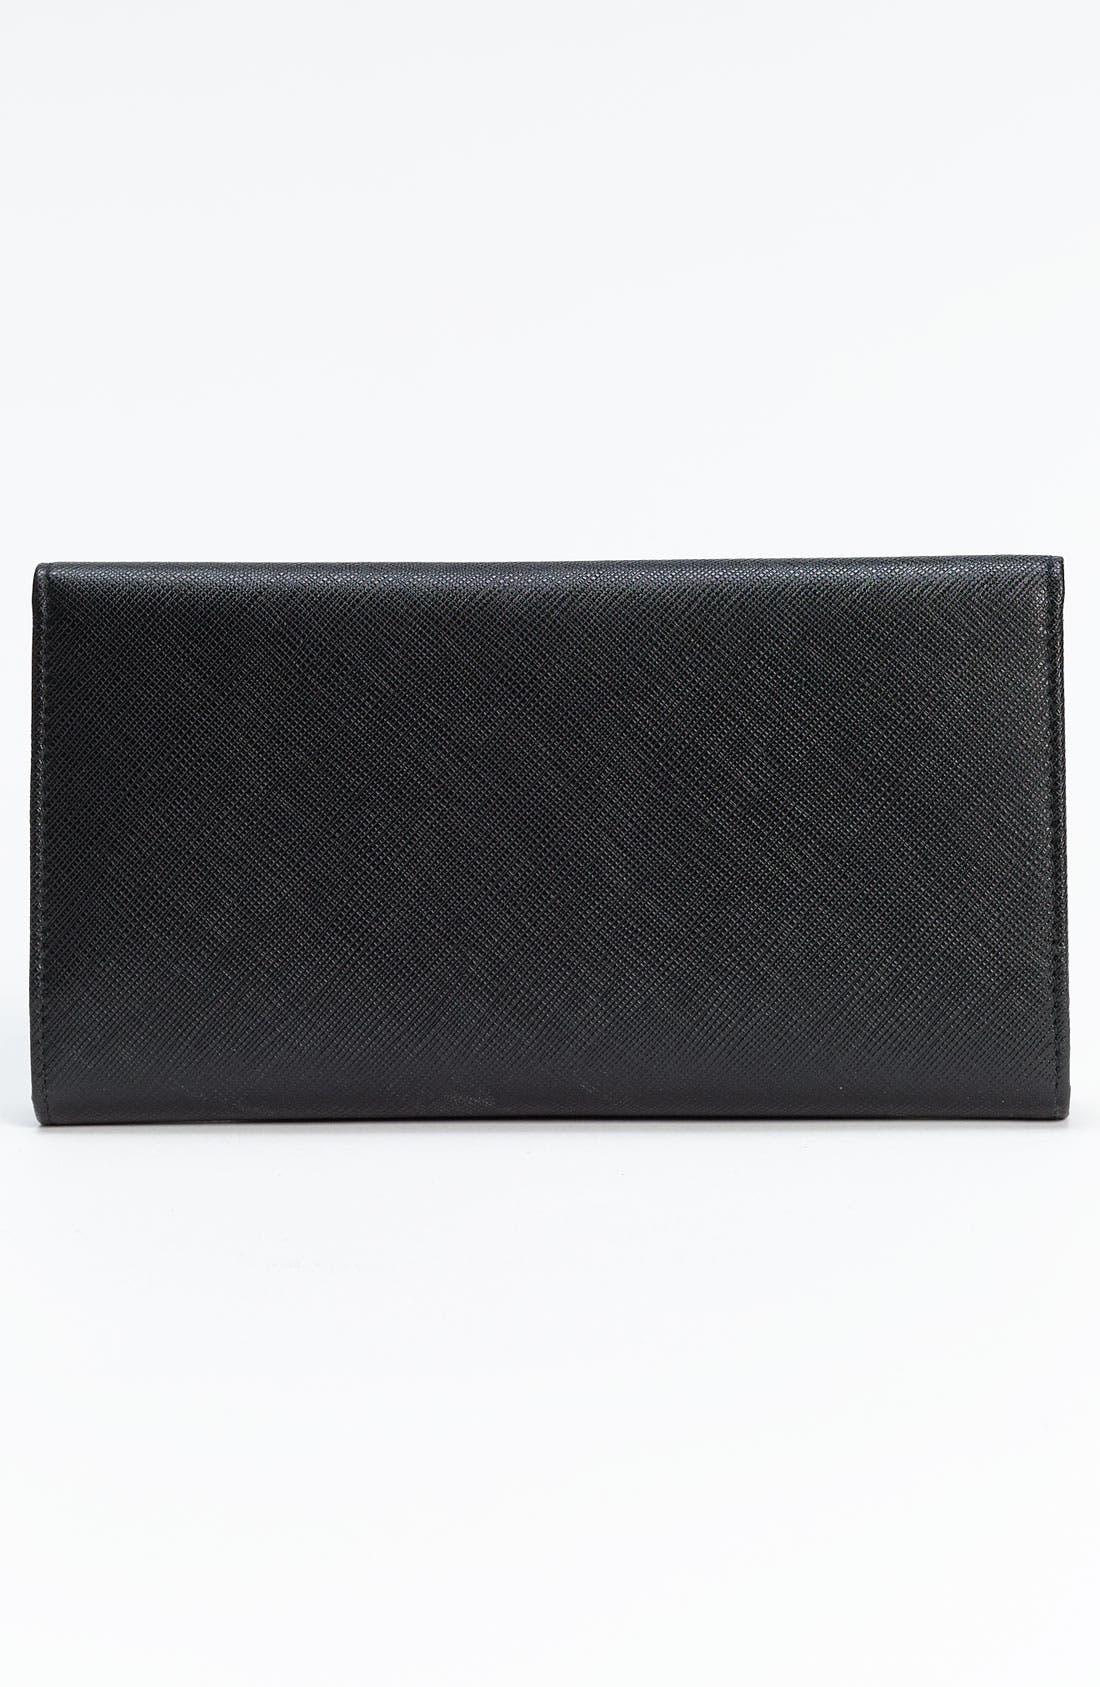 Alternate Image 3  - Salvatore Ferragamo 'Vara' Continental Wallet